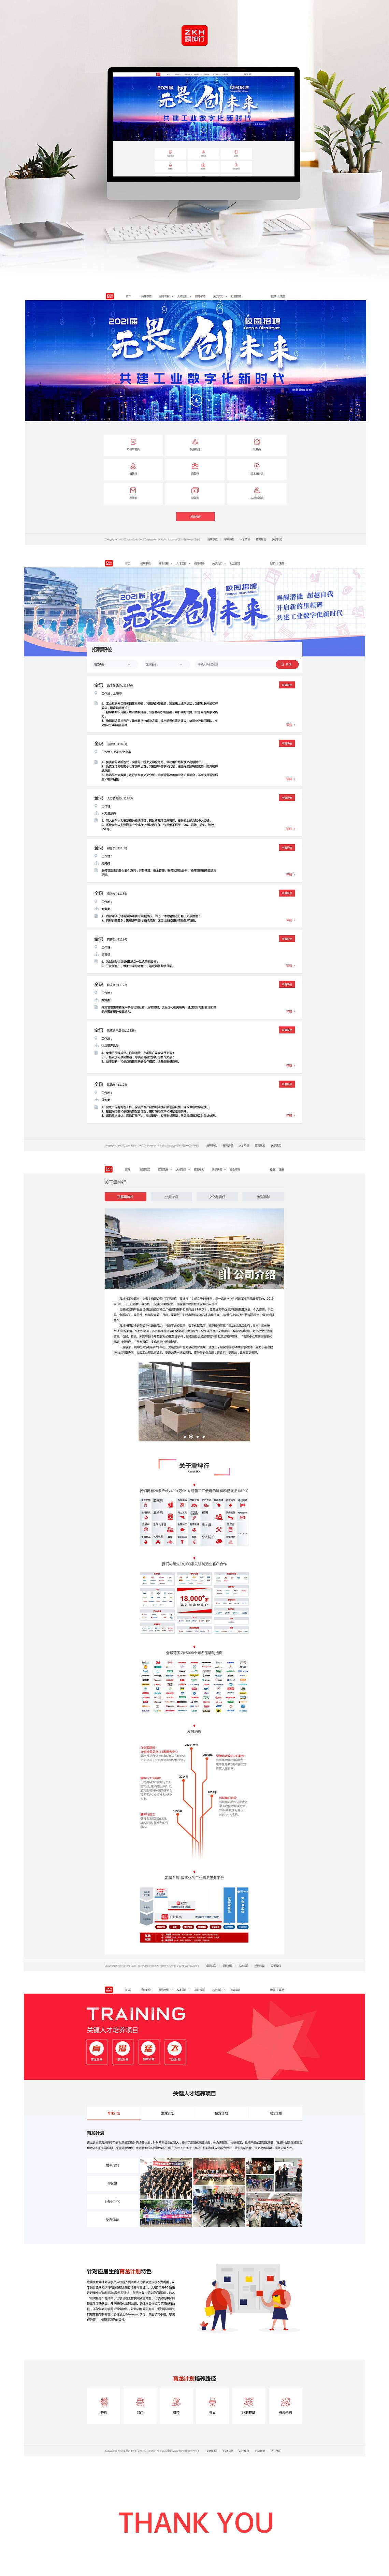 imart360.zhiye.com